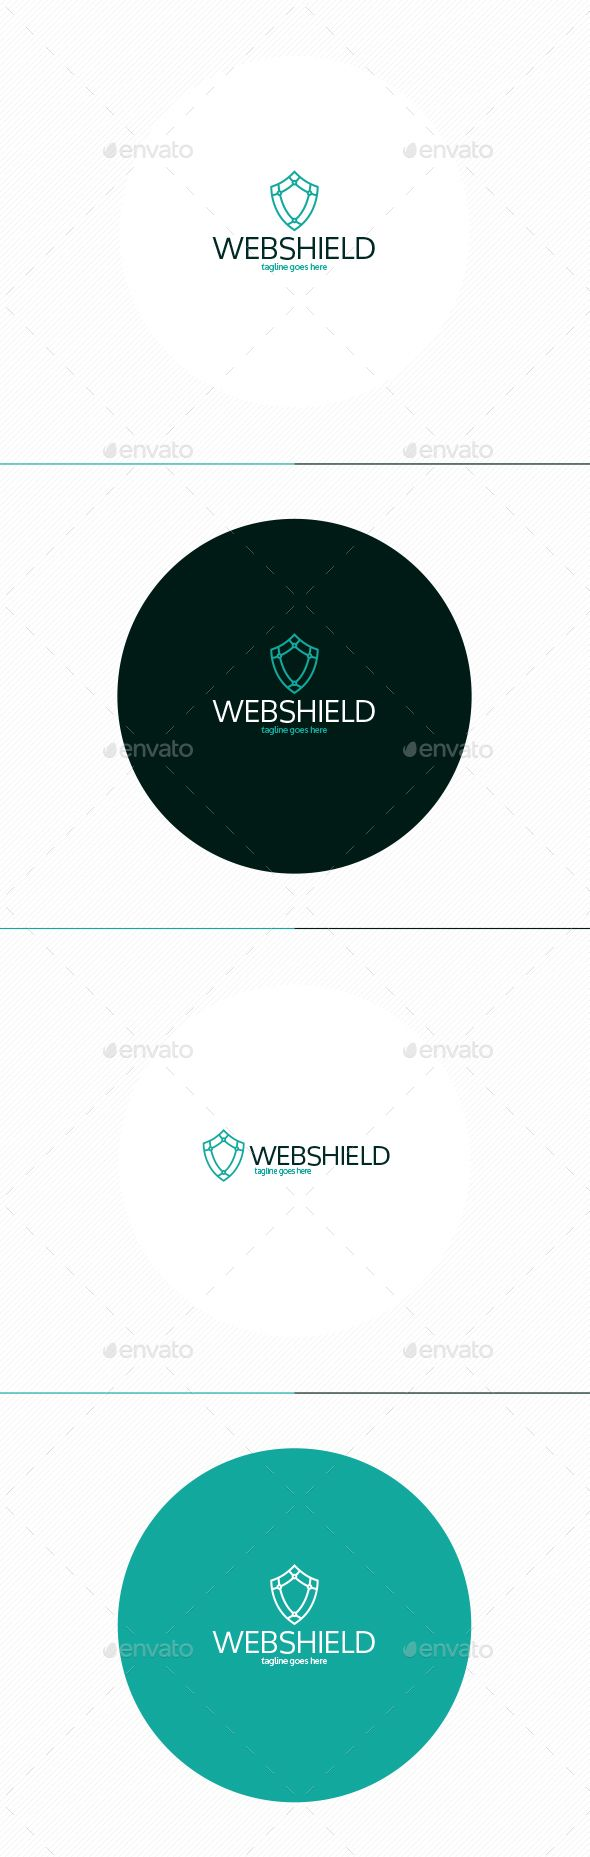 Web Shield Logo  #technology #web #world • Available here → http://graphicriver.net/item/web-shield-logo/15362611?s_rank=188&ref=pxcr